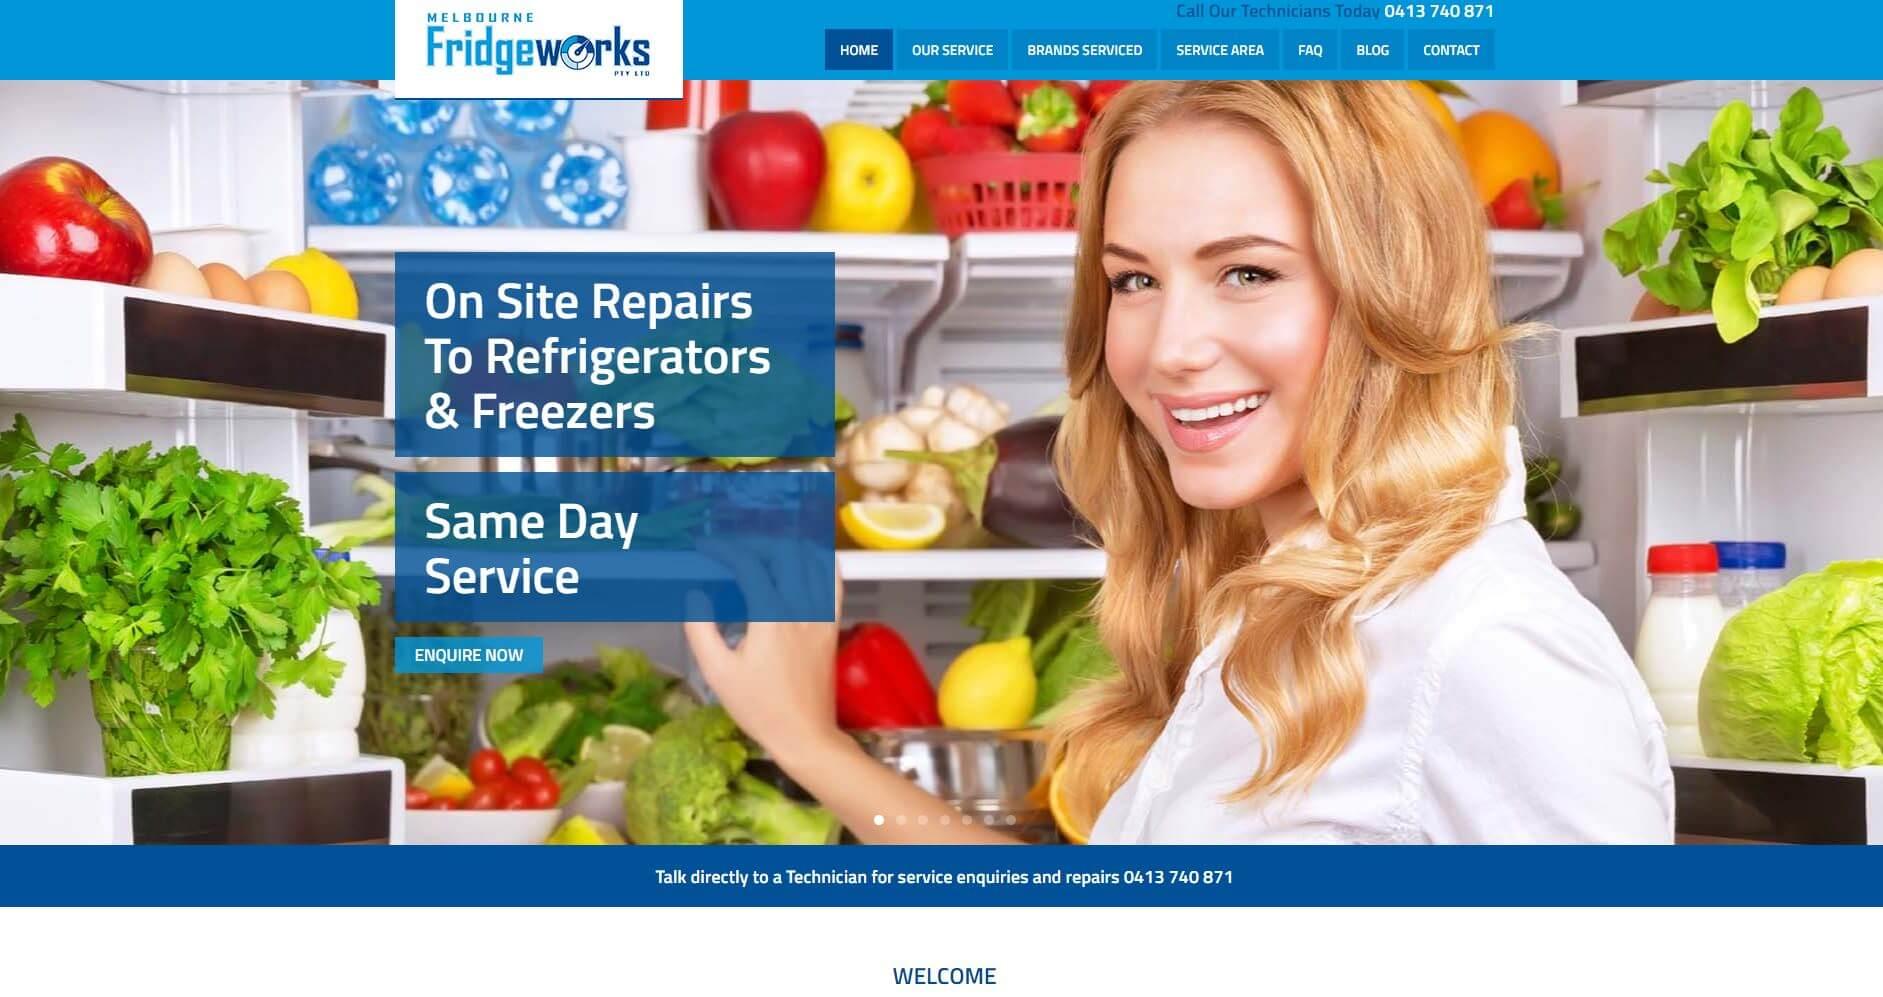 Melbourne Fridge Works